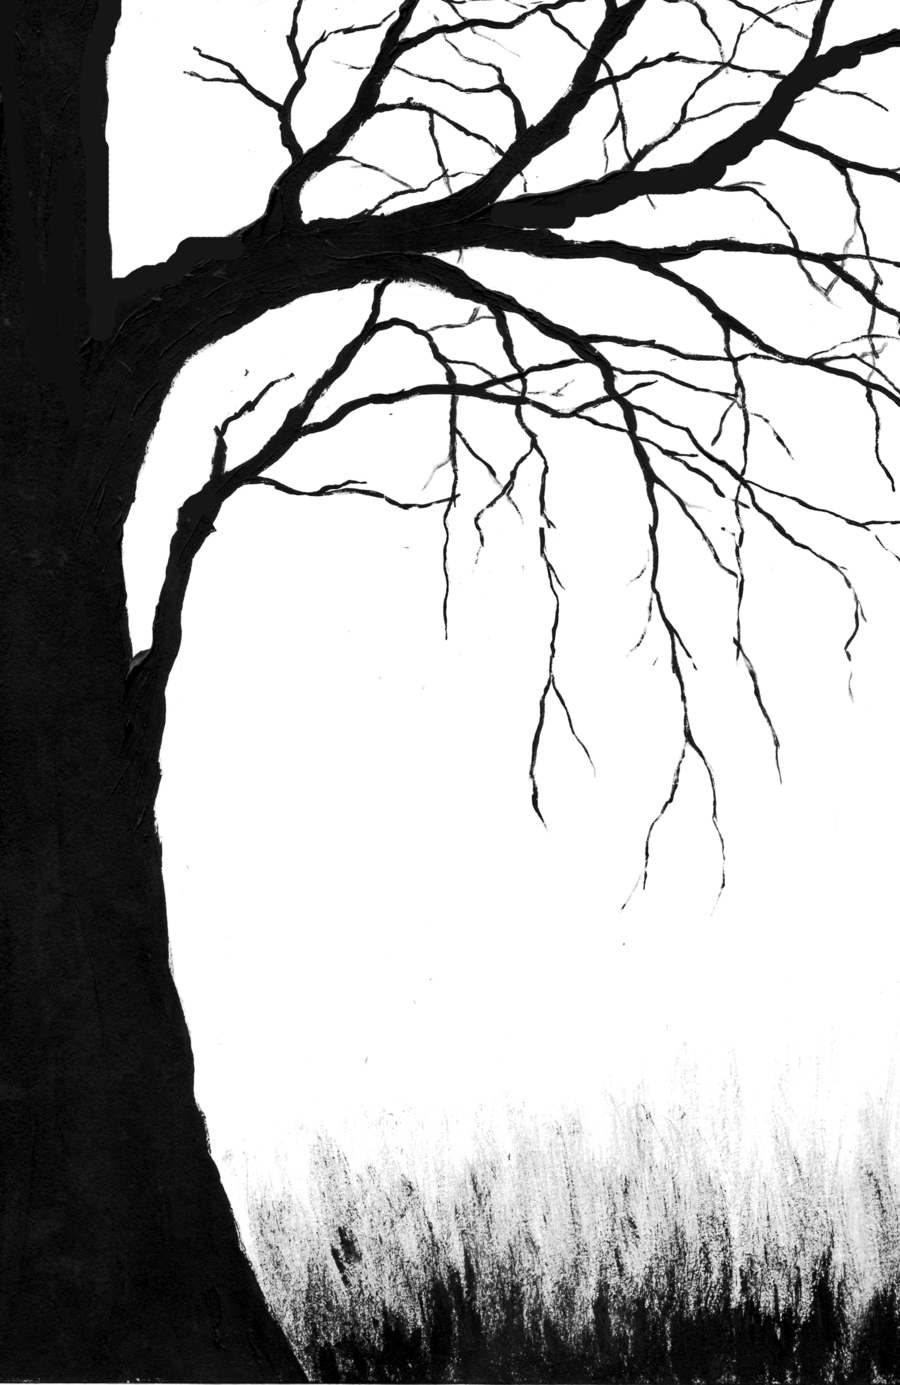 Creepy Tree Tree Trunk Drawing Silhouette Drawing Tree Drawing Simple